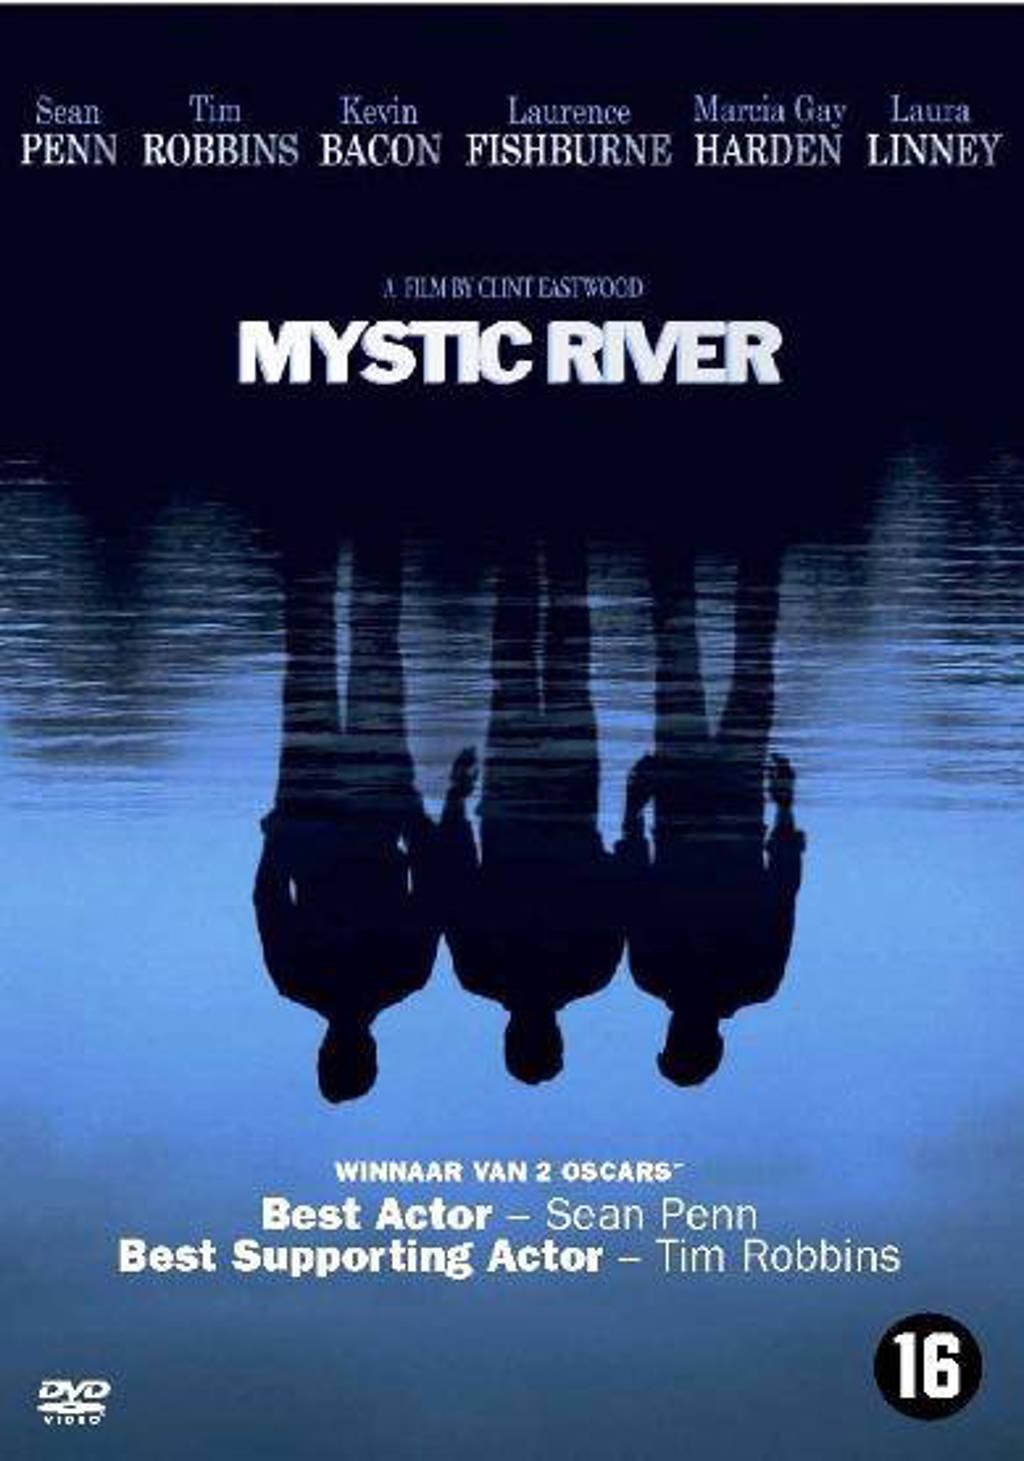 Mystic river (DVD)